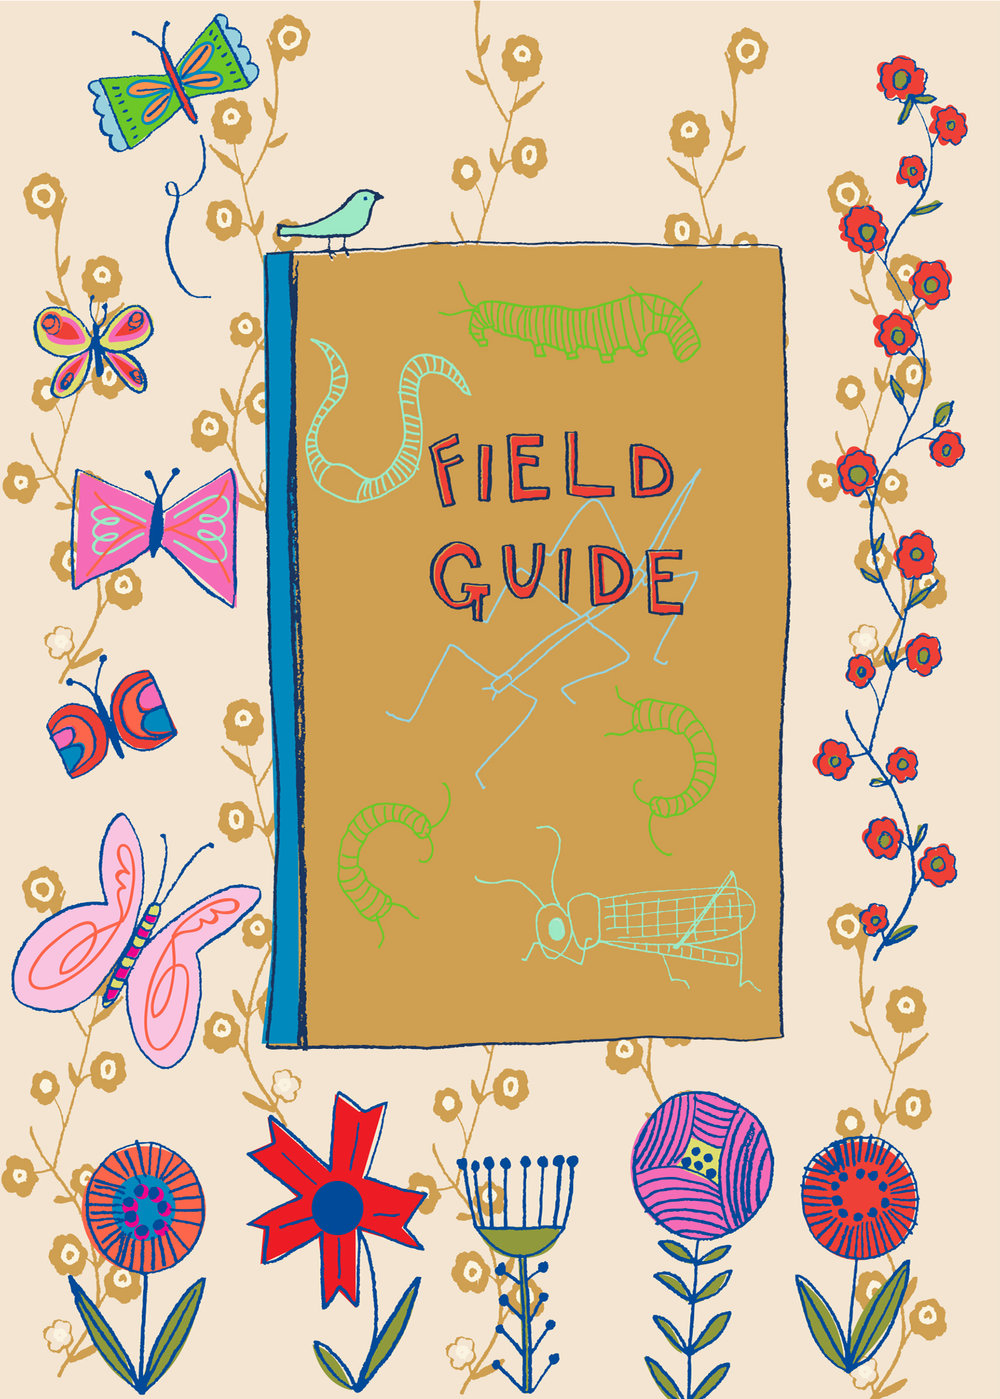 jami_darwin_field_guide.jpg